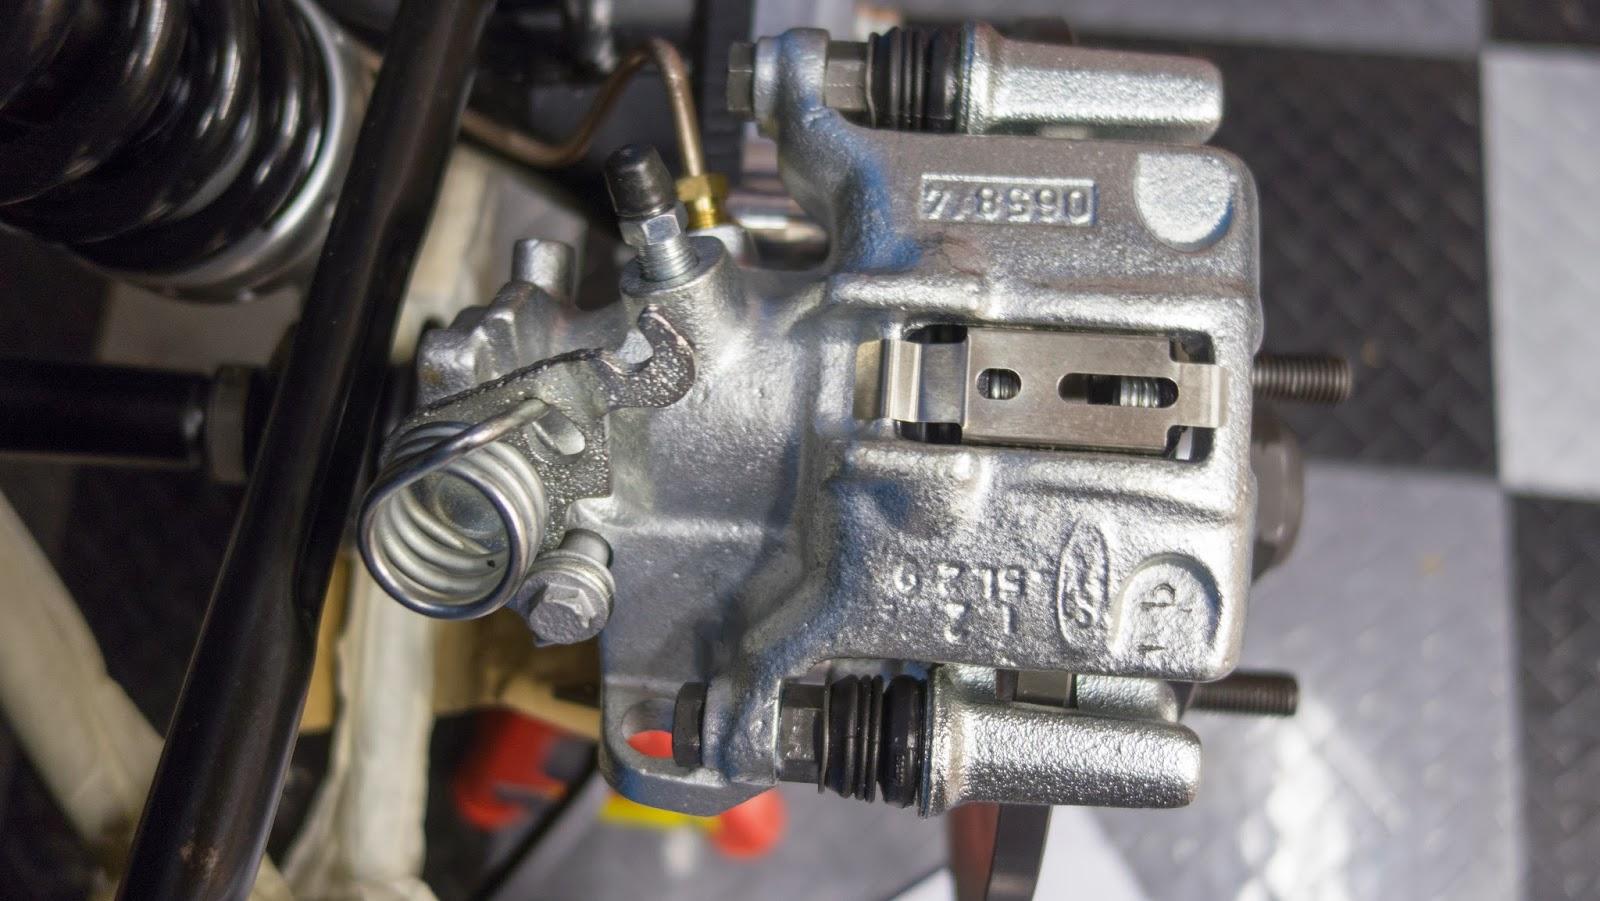 One brake calliper finished.